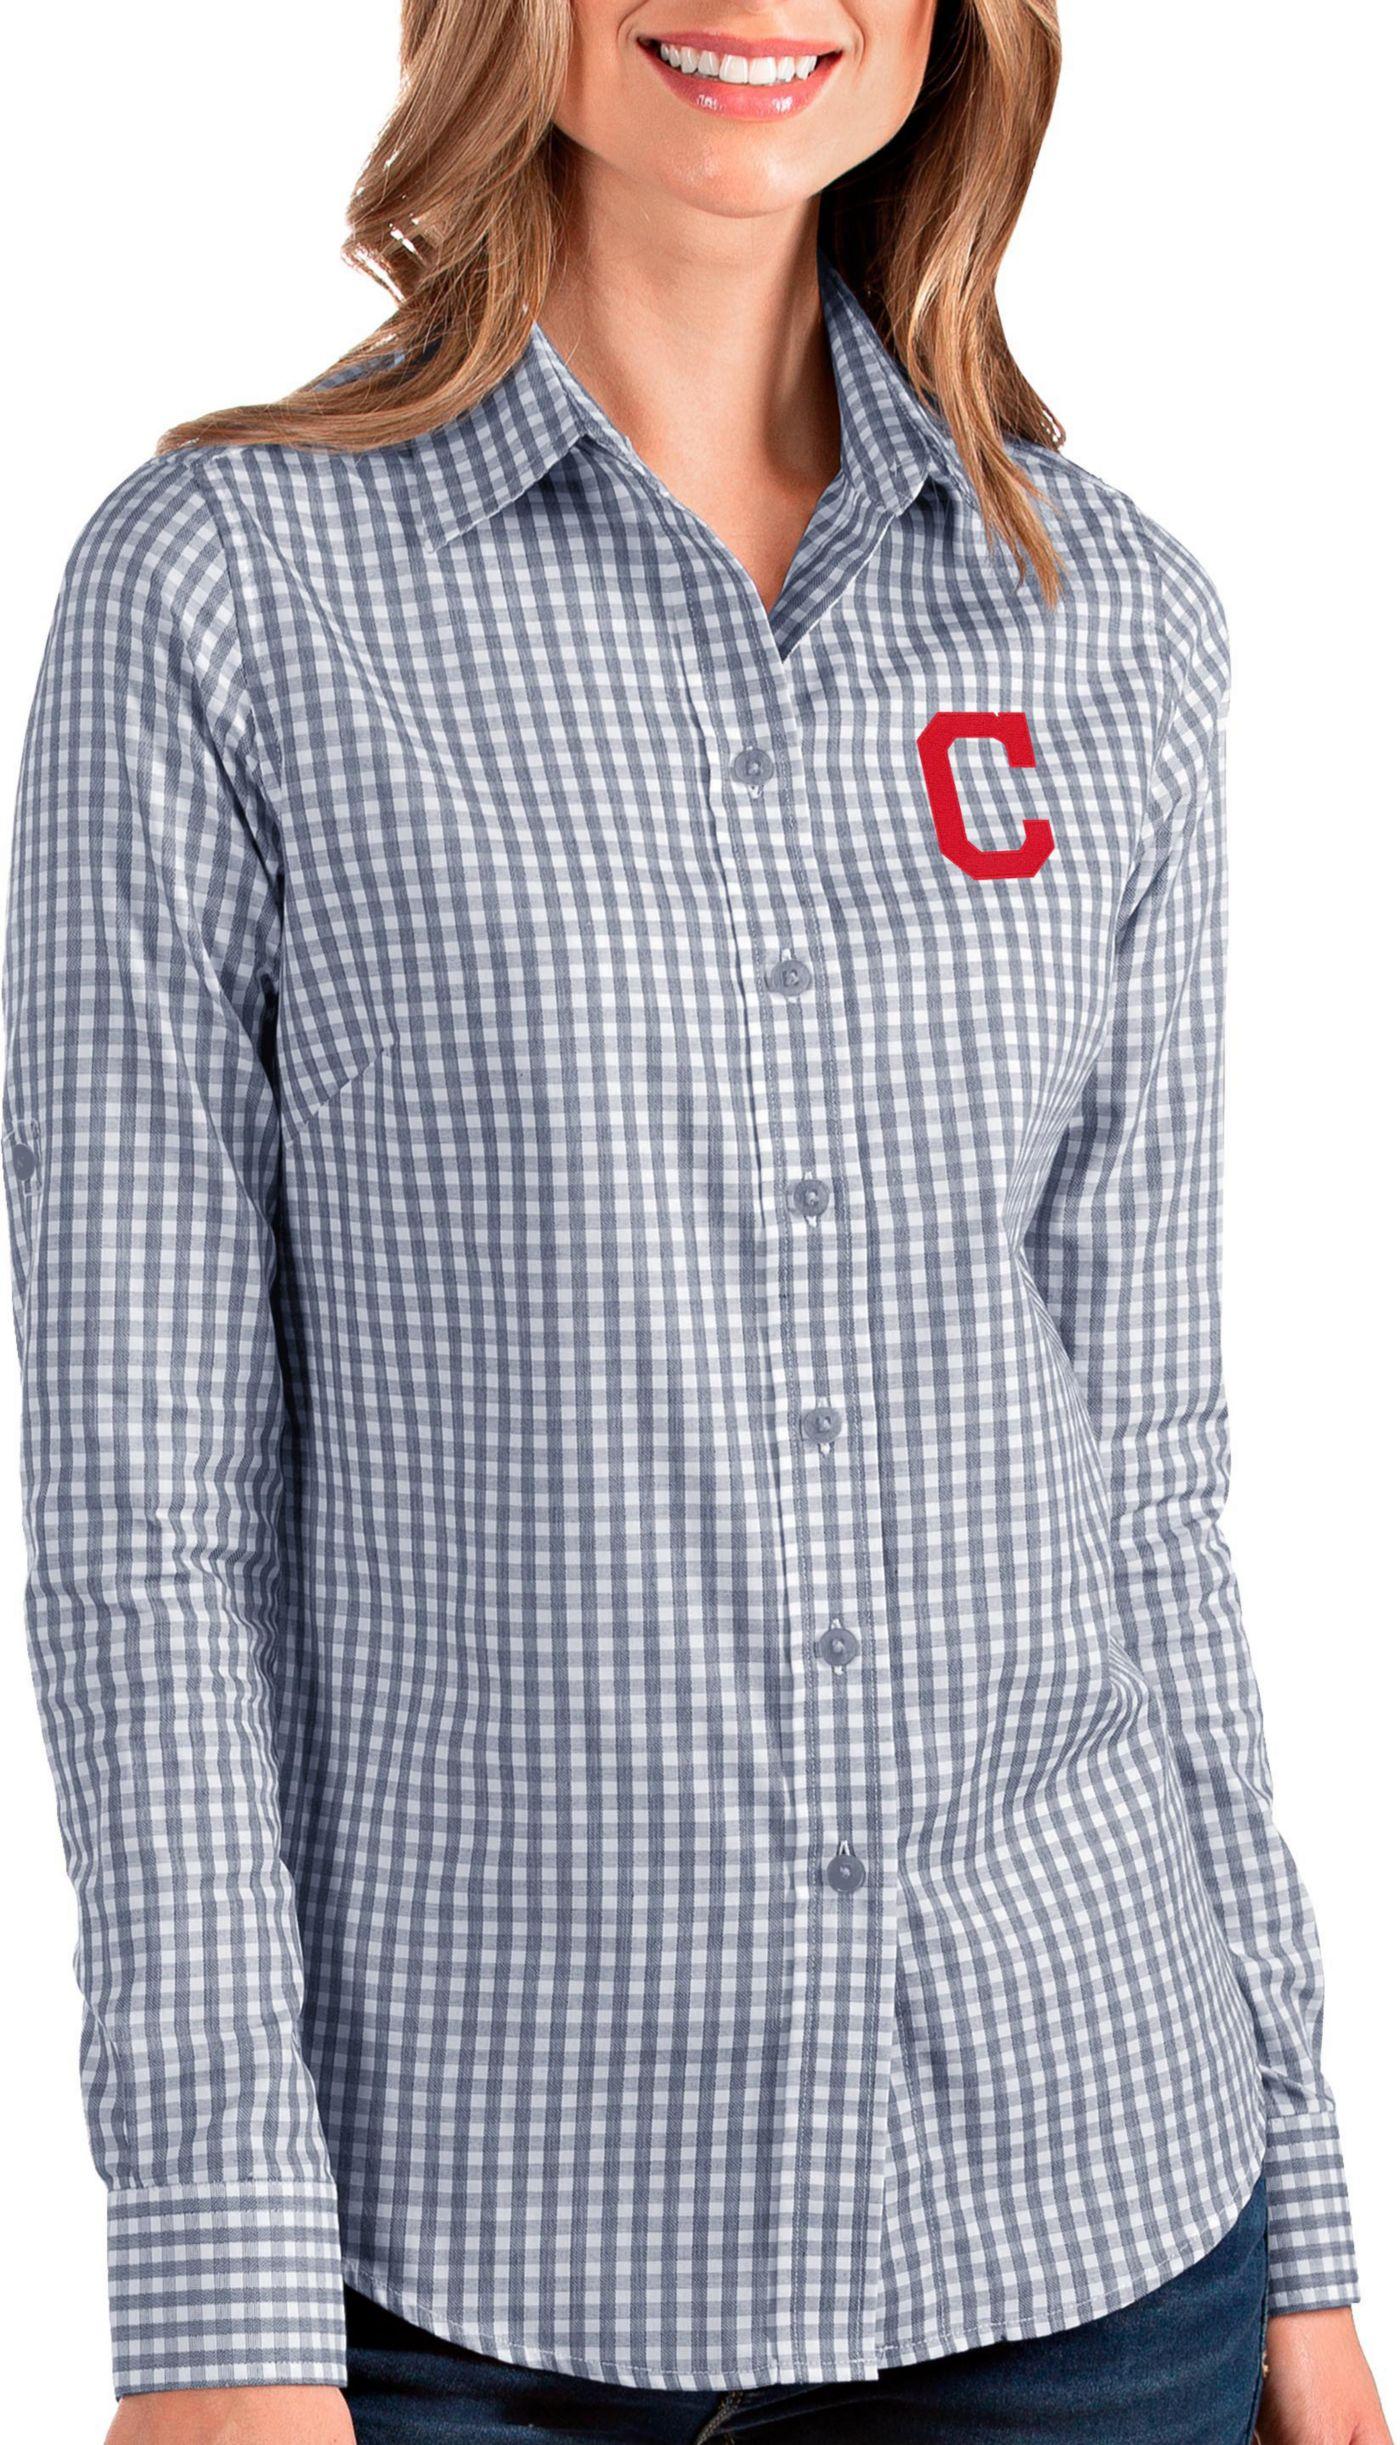 Antigua Women's Cleveland Indians Structure Button-Up Navy Long Sleeve Shirt